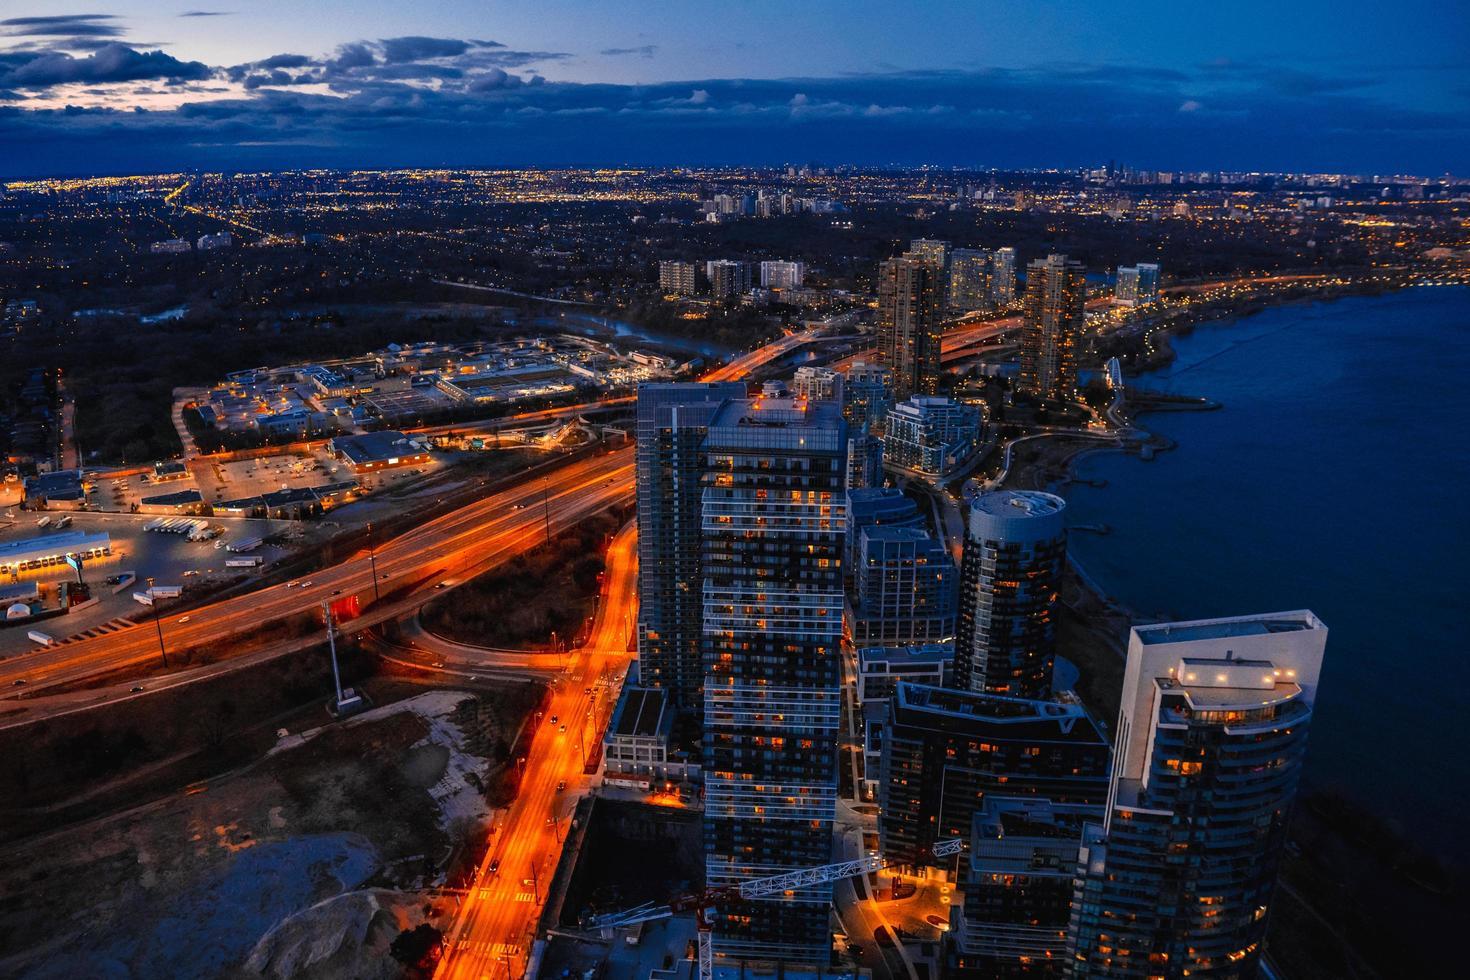 vista aérea de toronto, canadá foto